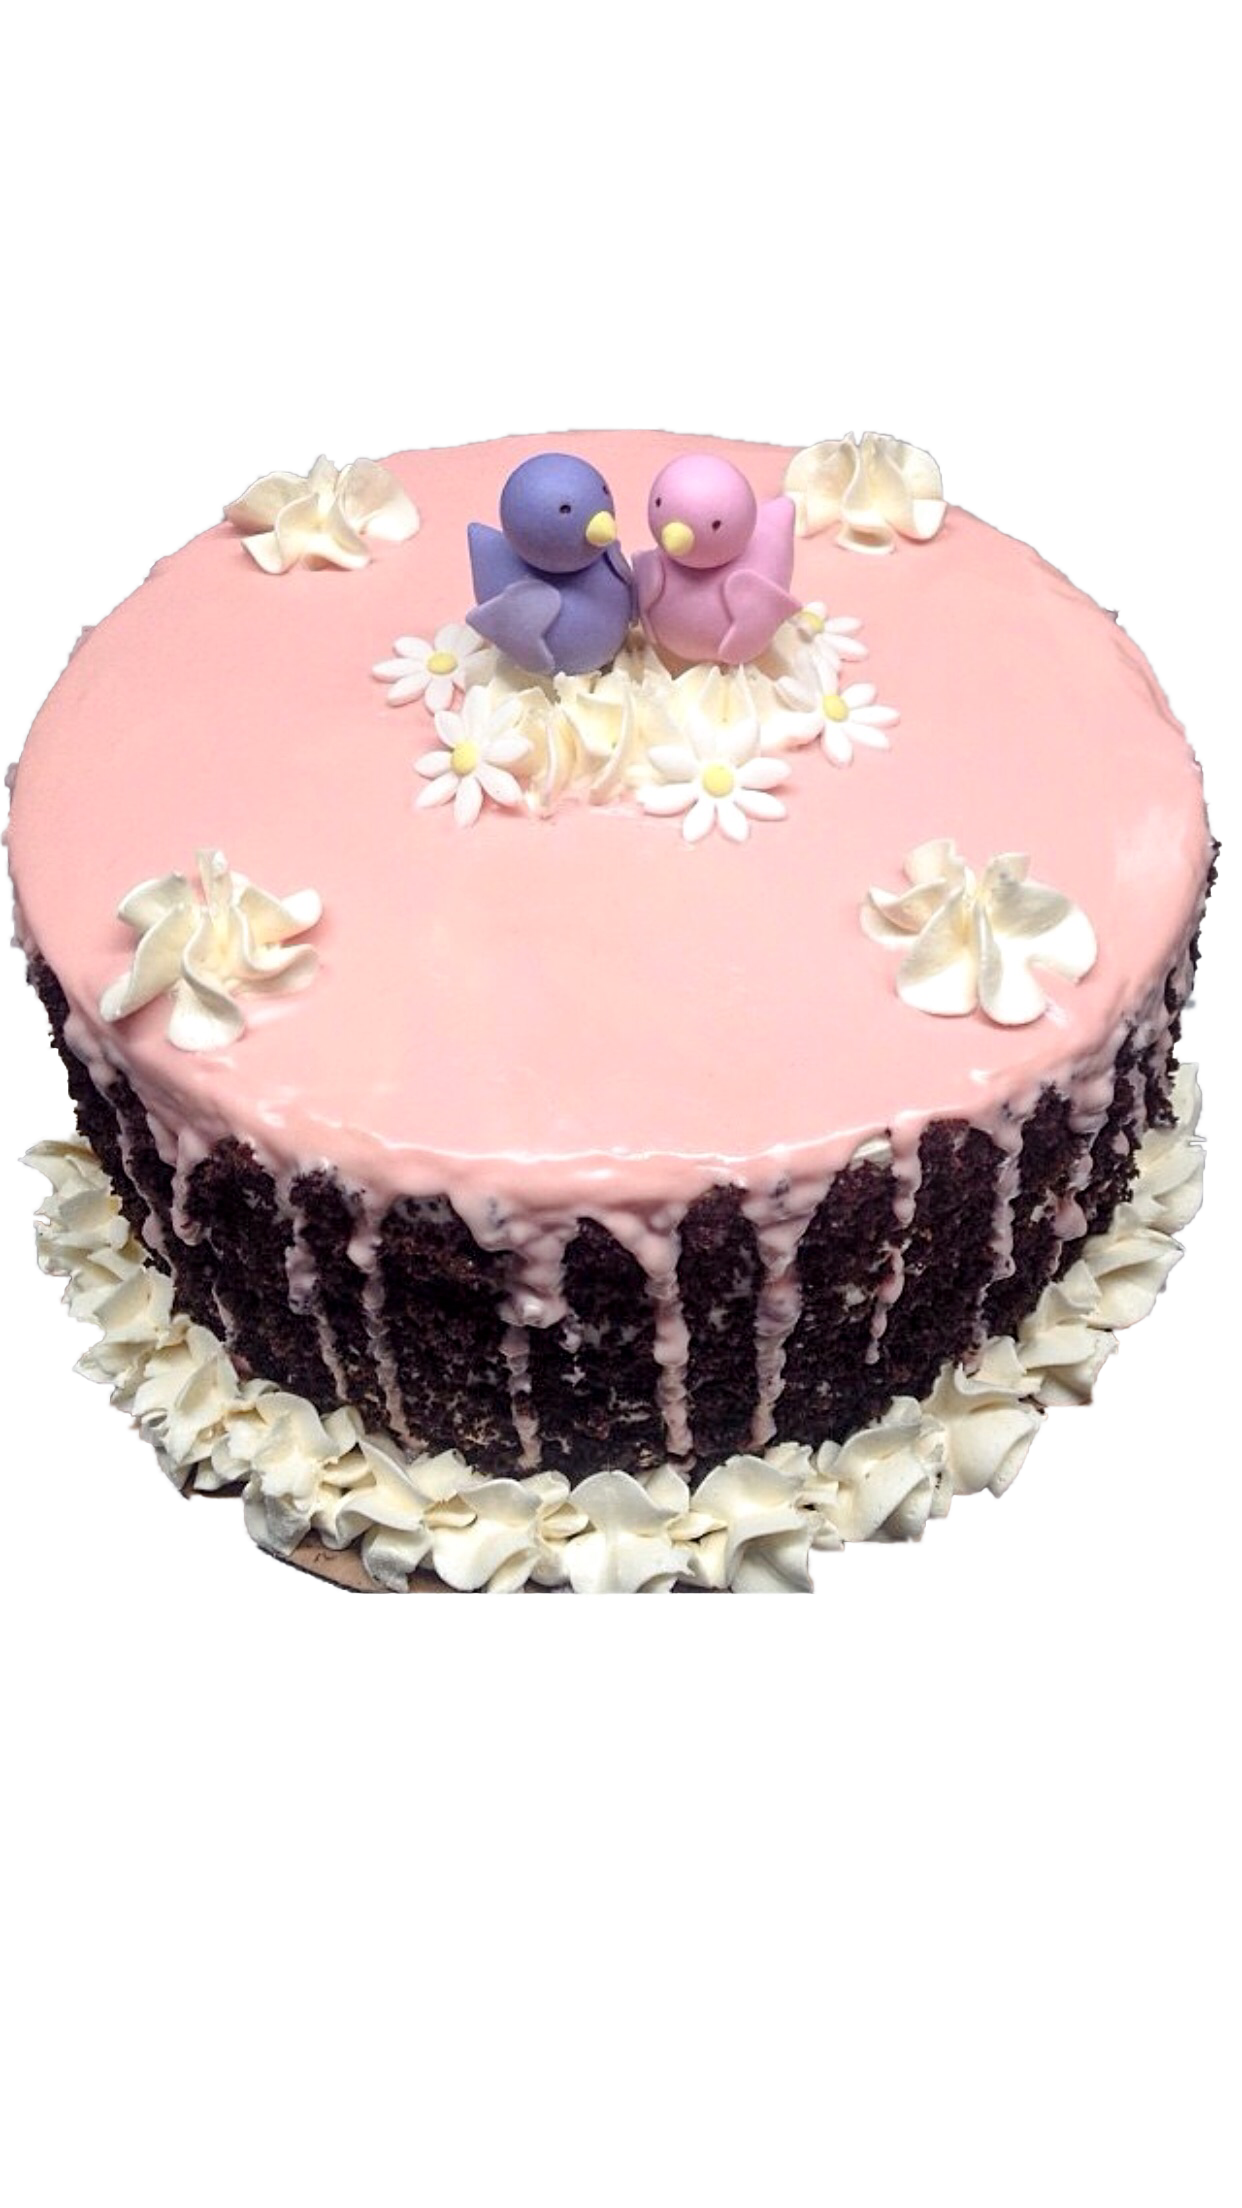 Bird Buttercream cake